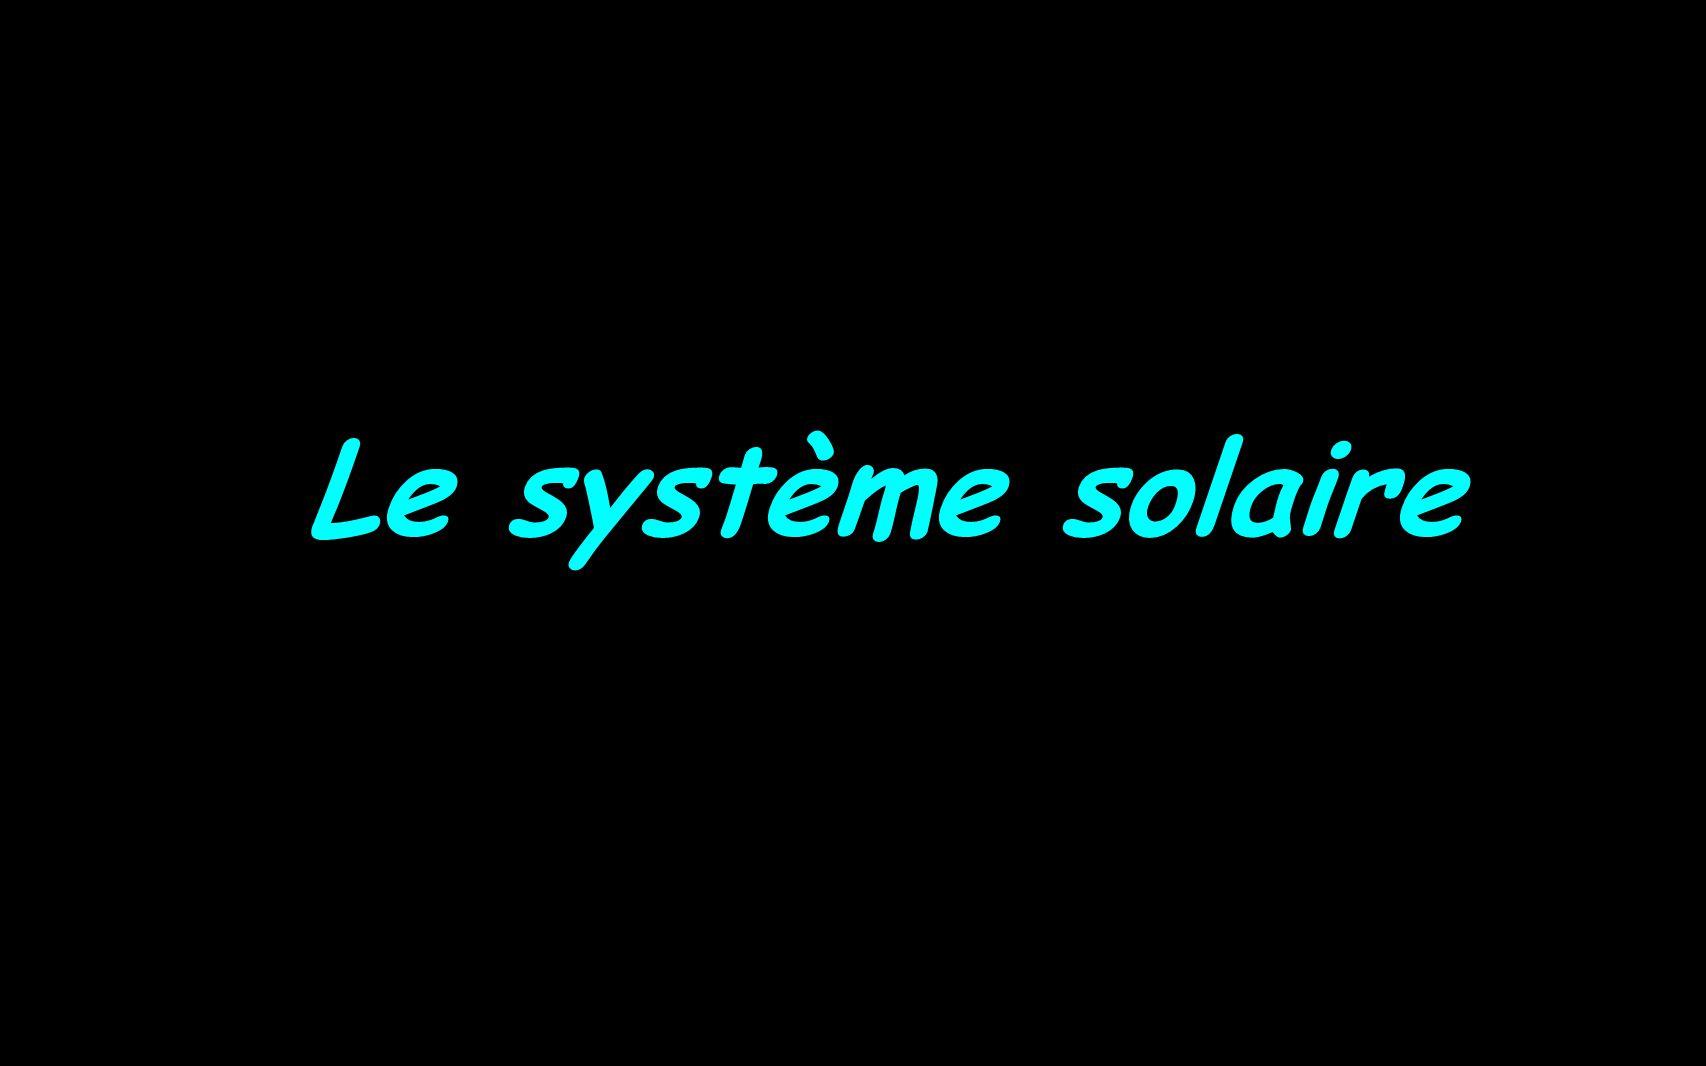 (Pluton) Mars Jupiter Saturne Uranus Neptune Mercure Terre Vénus